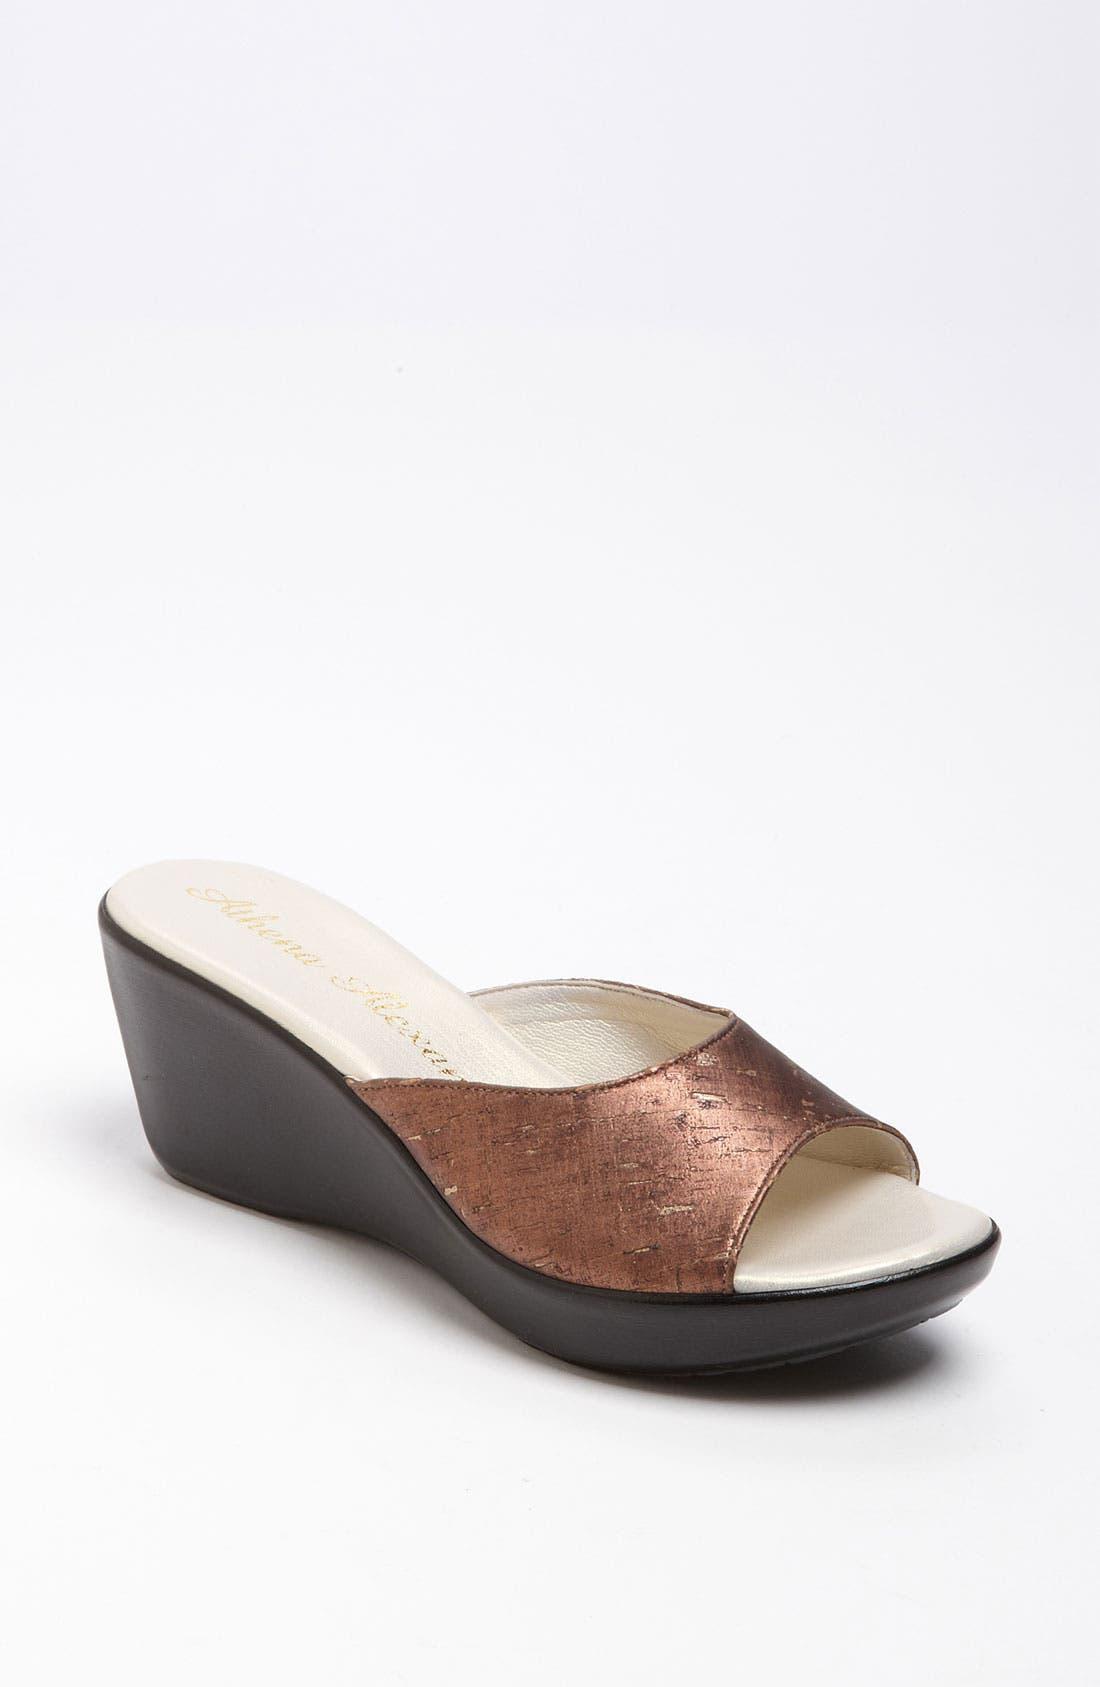 Alternate Image 1 Selected - Athena Alexander 'Danielle' Sandal